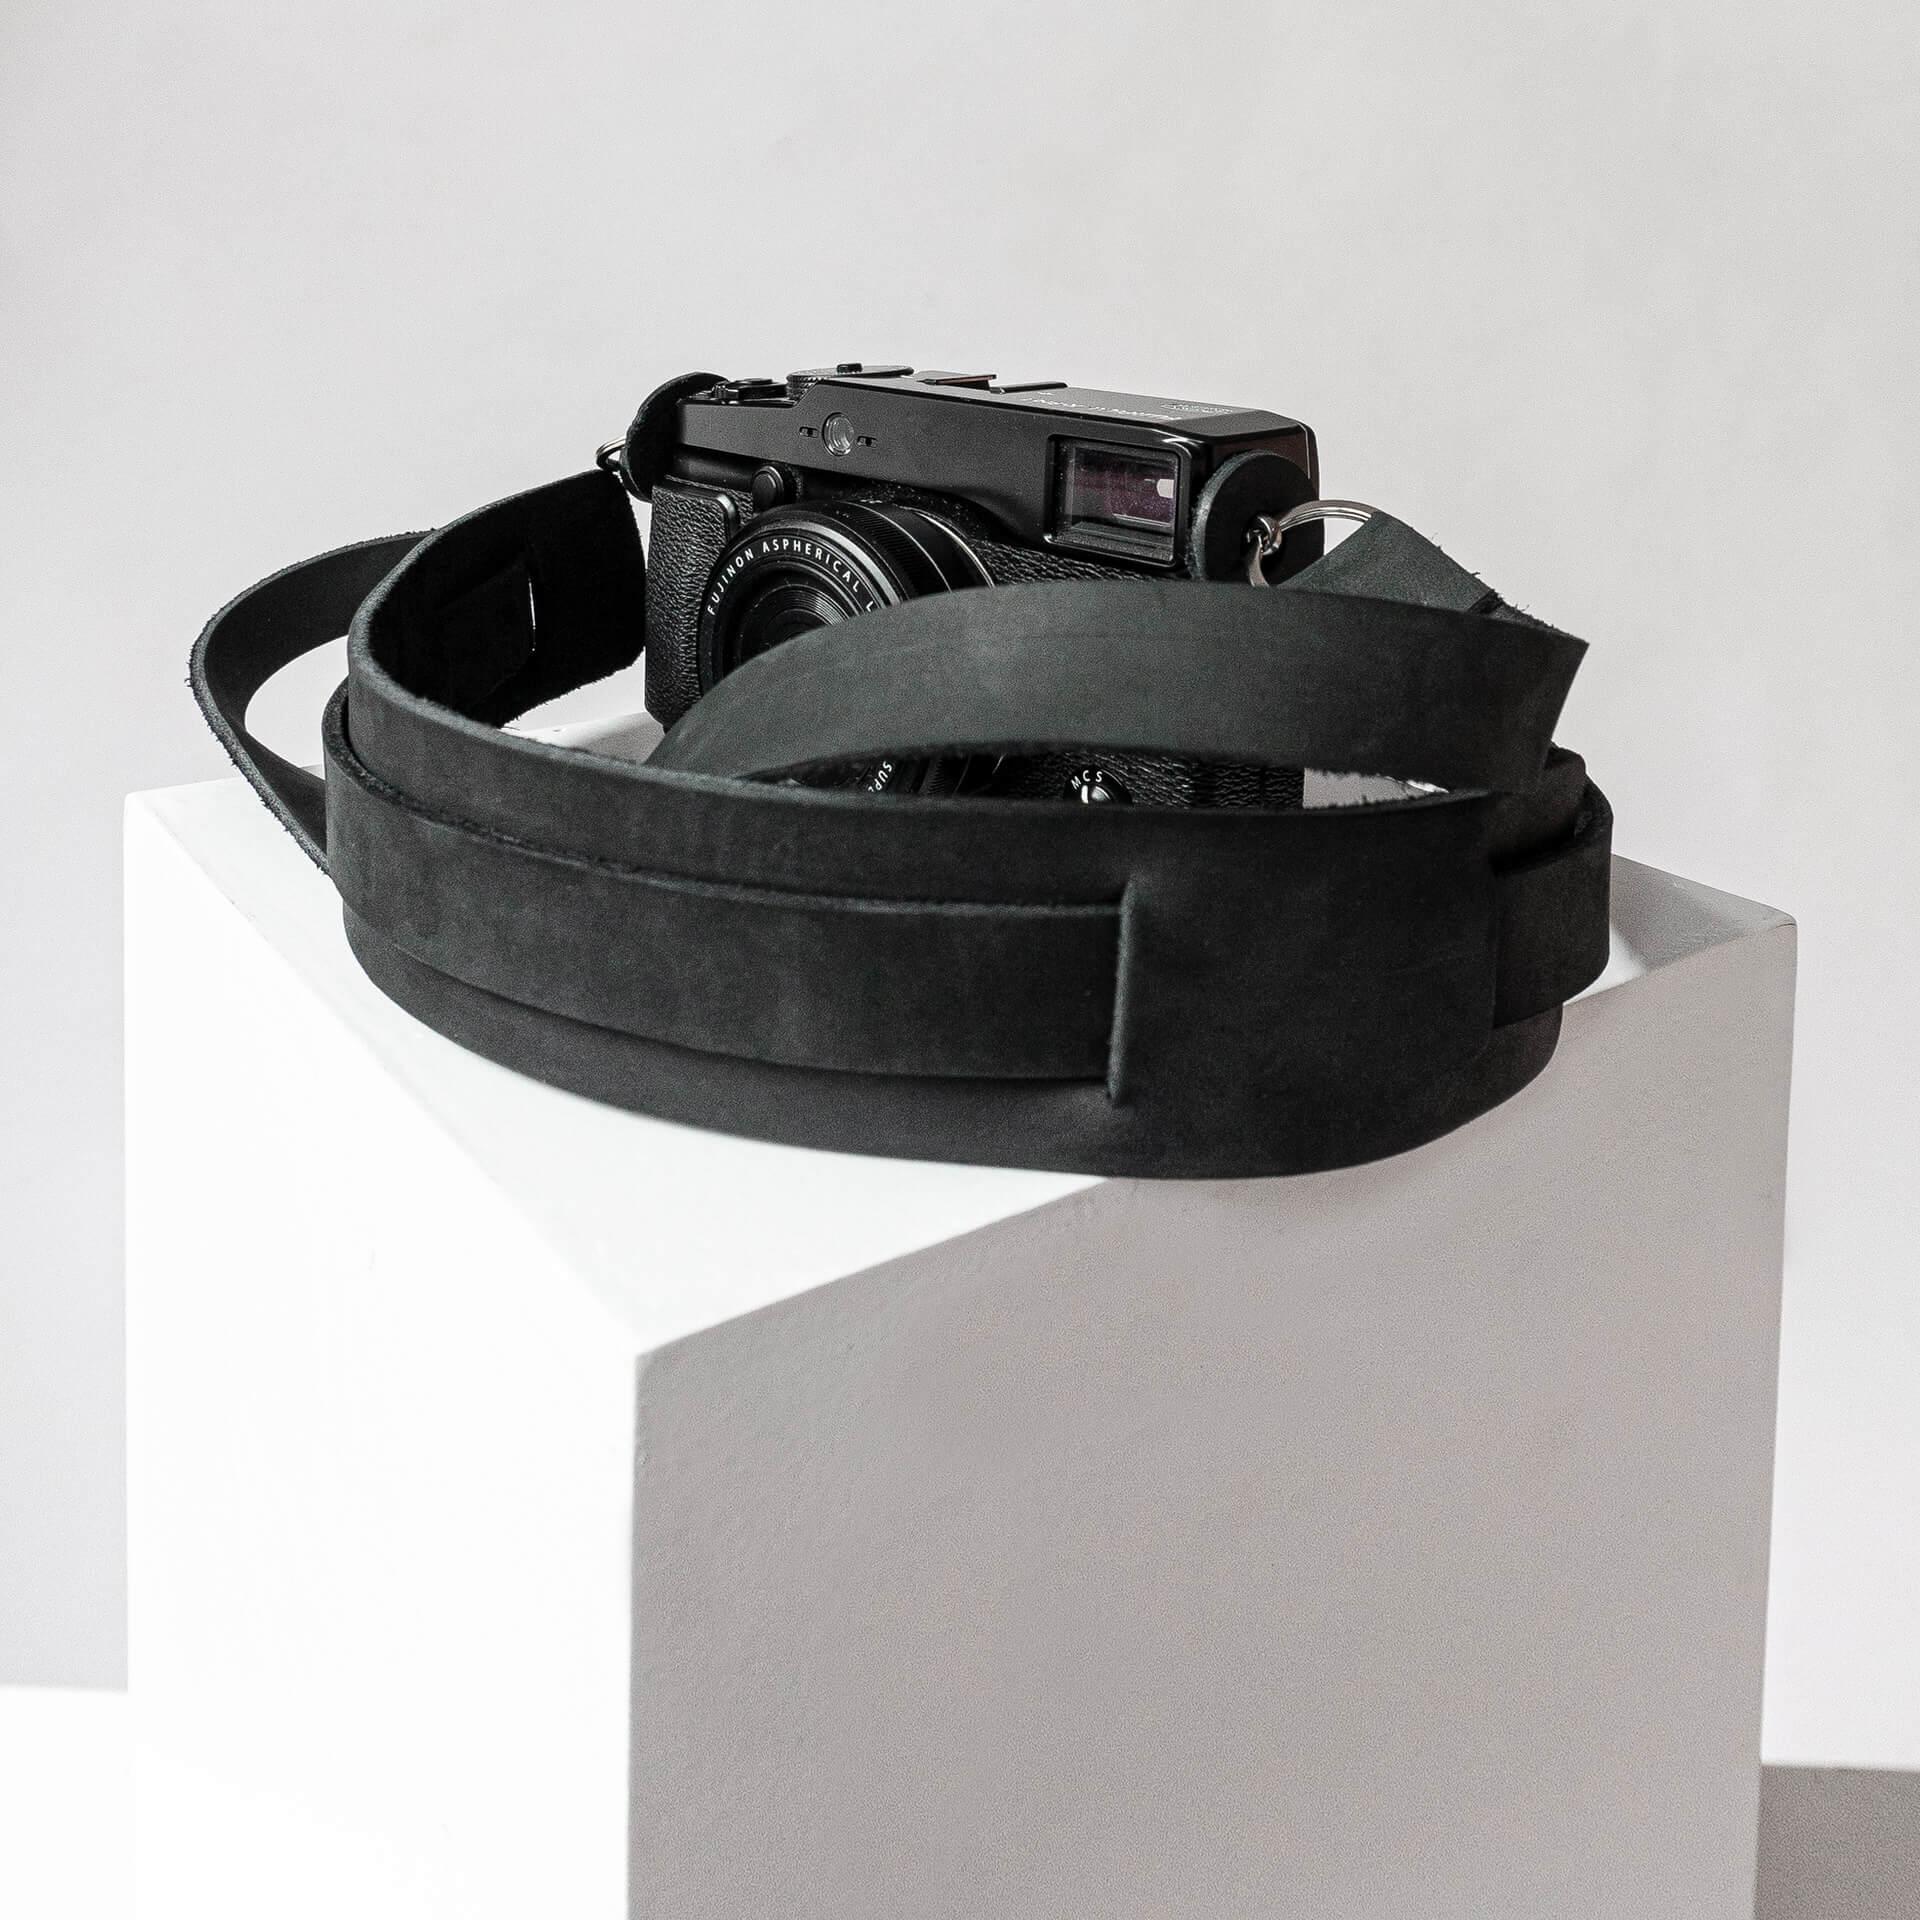 Detailaufnahme Kameragurt HAN in der Farbe Kohle.